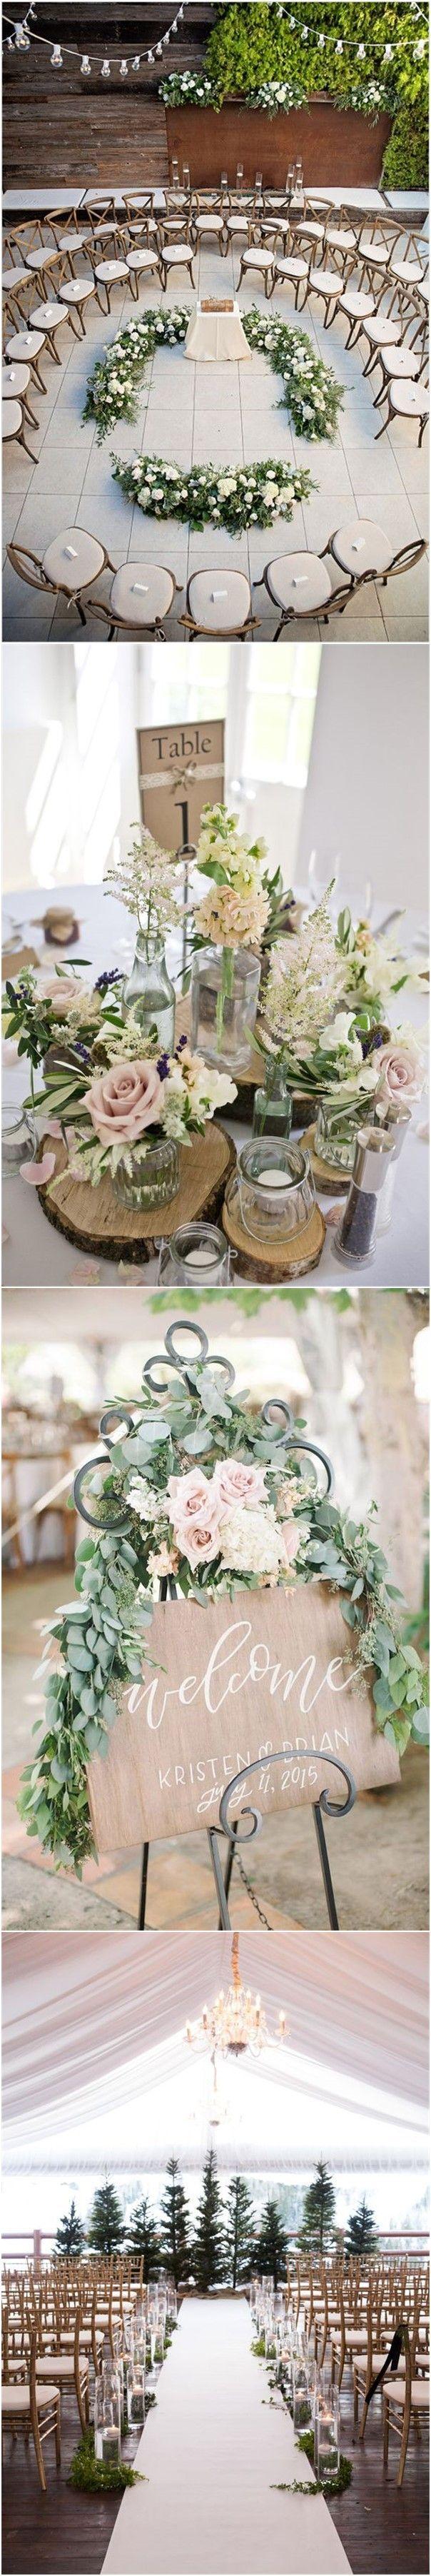 Green Wedding | Rustic Wedding Country Weddings » 25 Rustic Outdoor Wedding Ceremony Decorations Ideas » ❤️ See more: http://www.weddinginclude.com/2017/06/rustic-outdoor-wedding-ceremony-decorations-ideas/